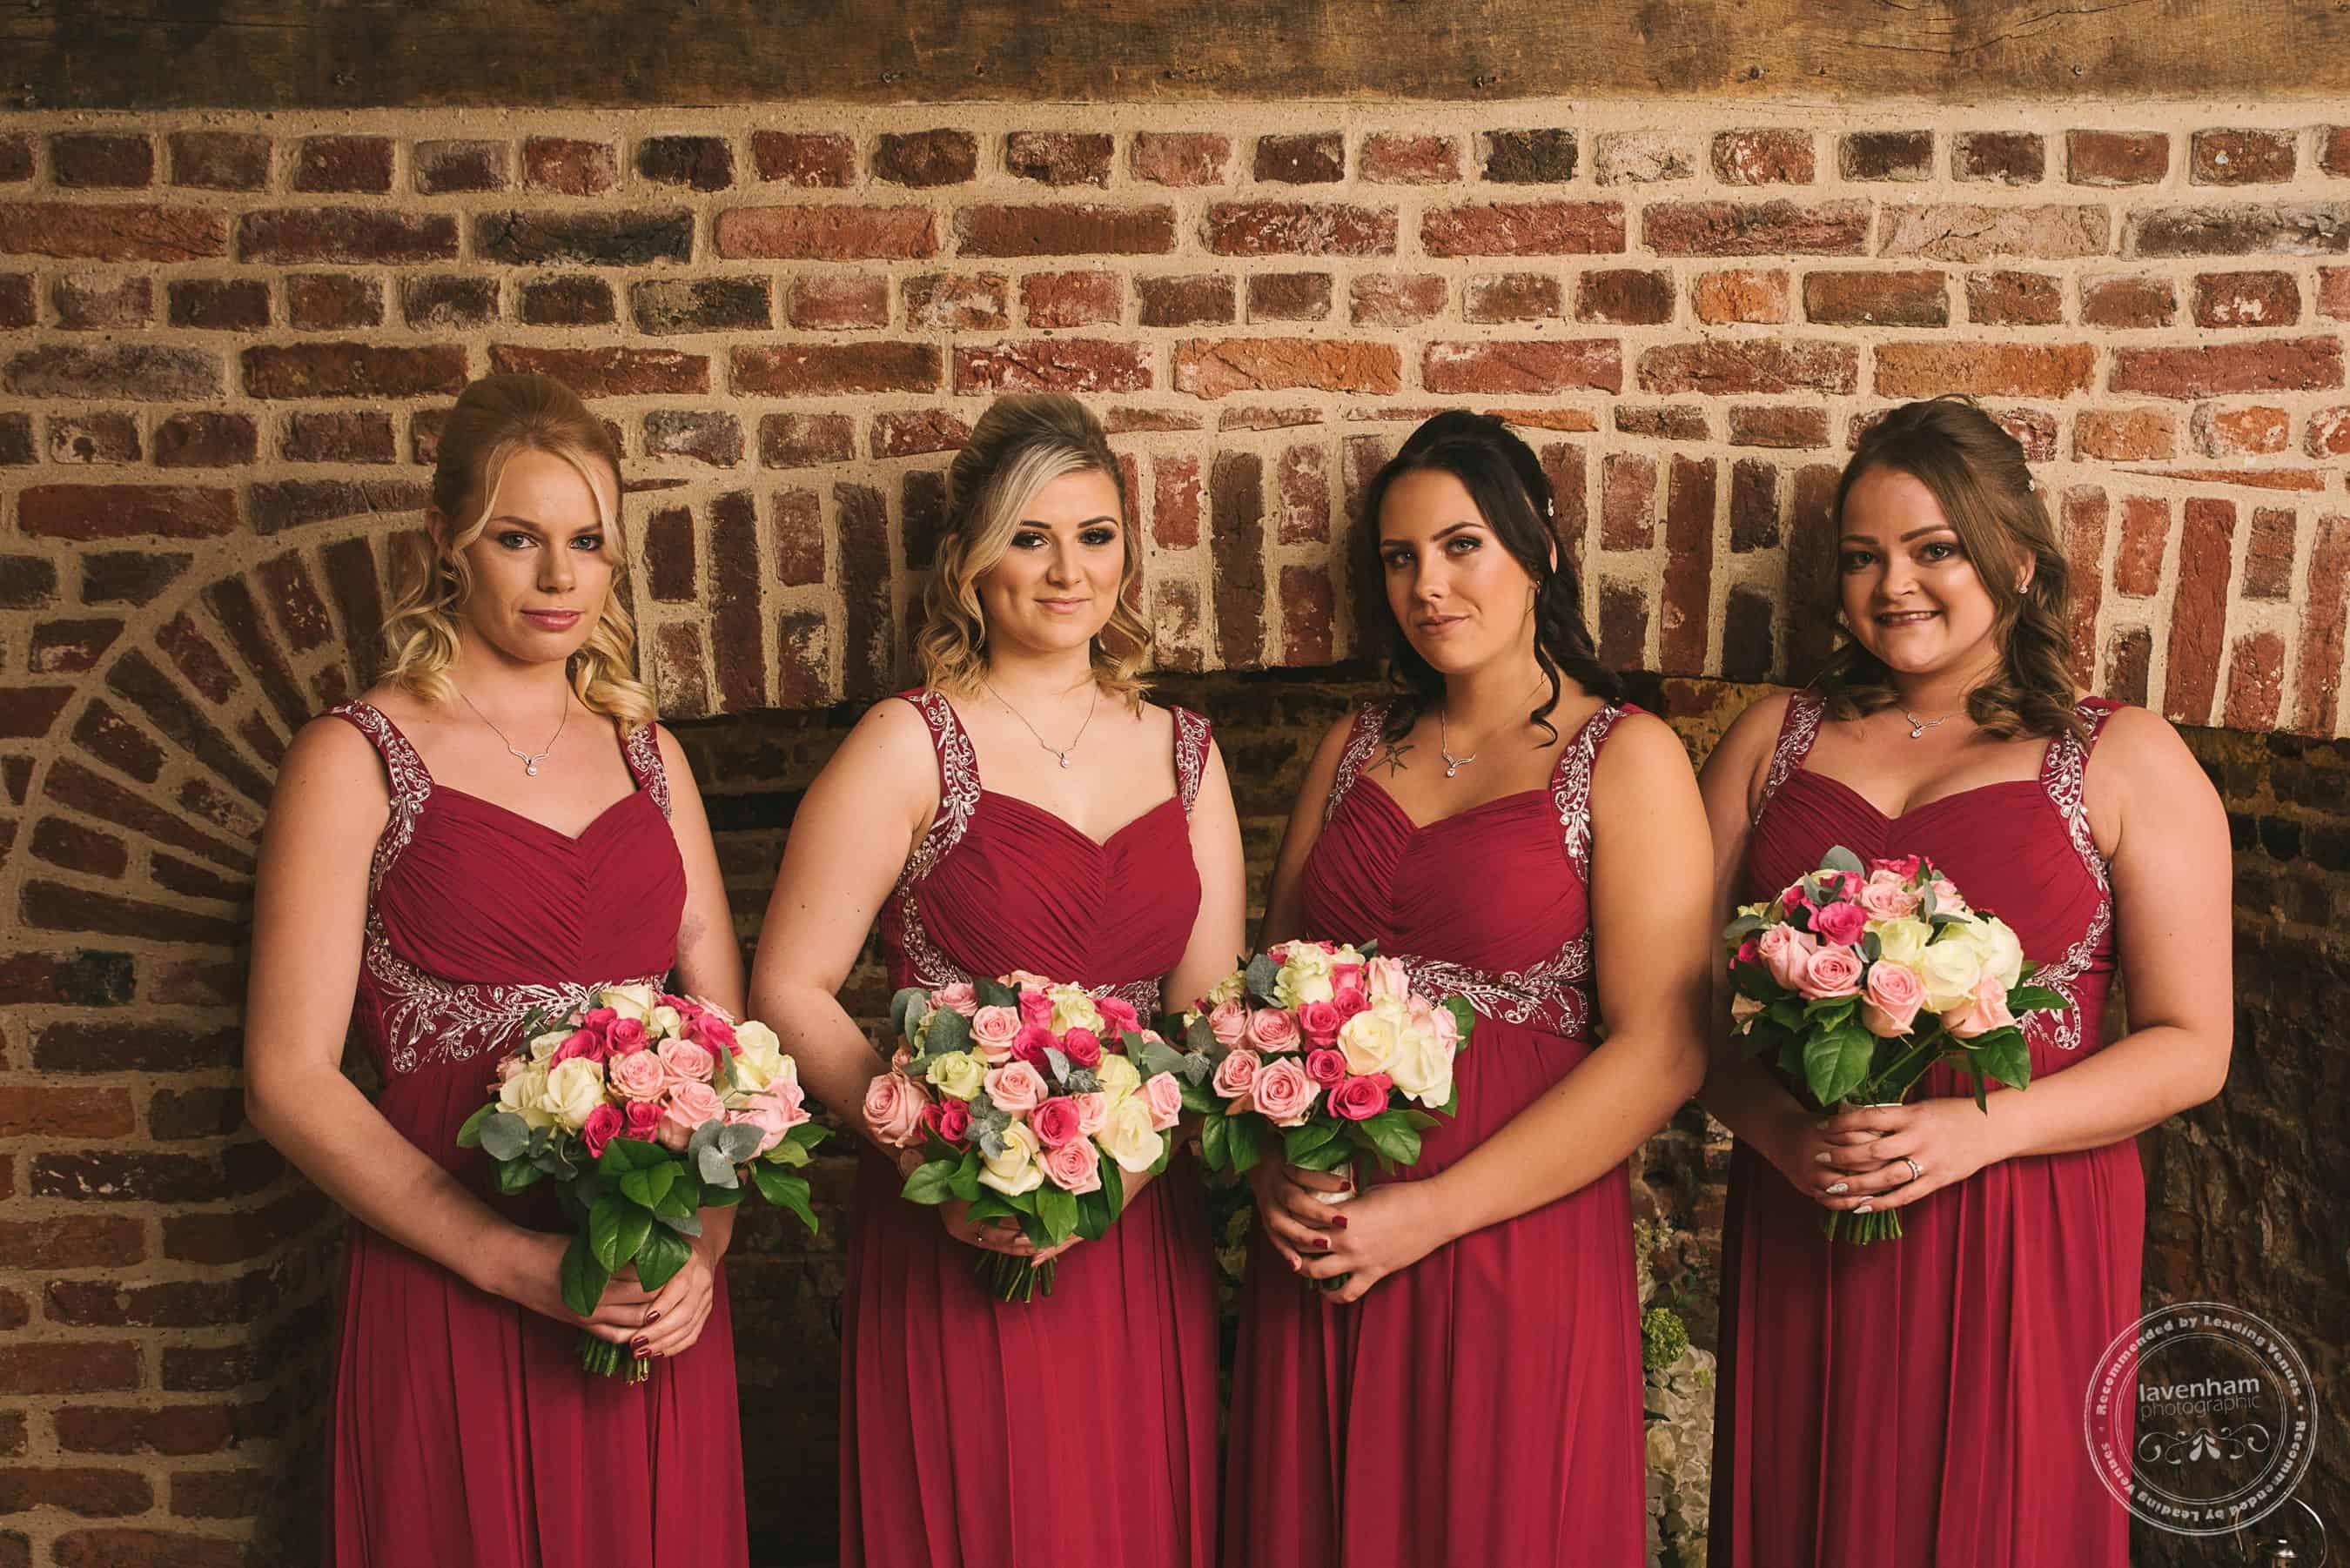 251118 Leez Priory Wedding Photography by Lavenham Photographic 027